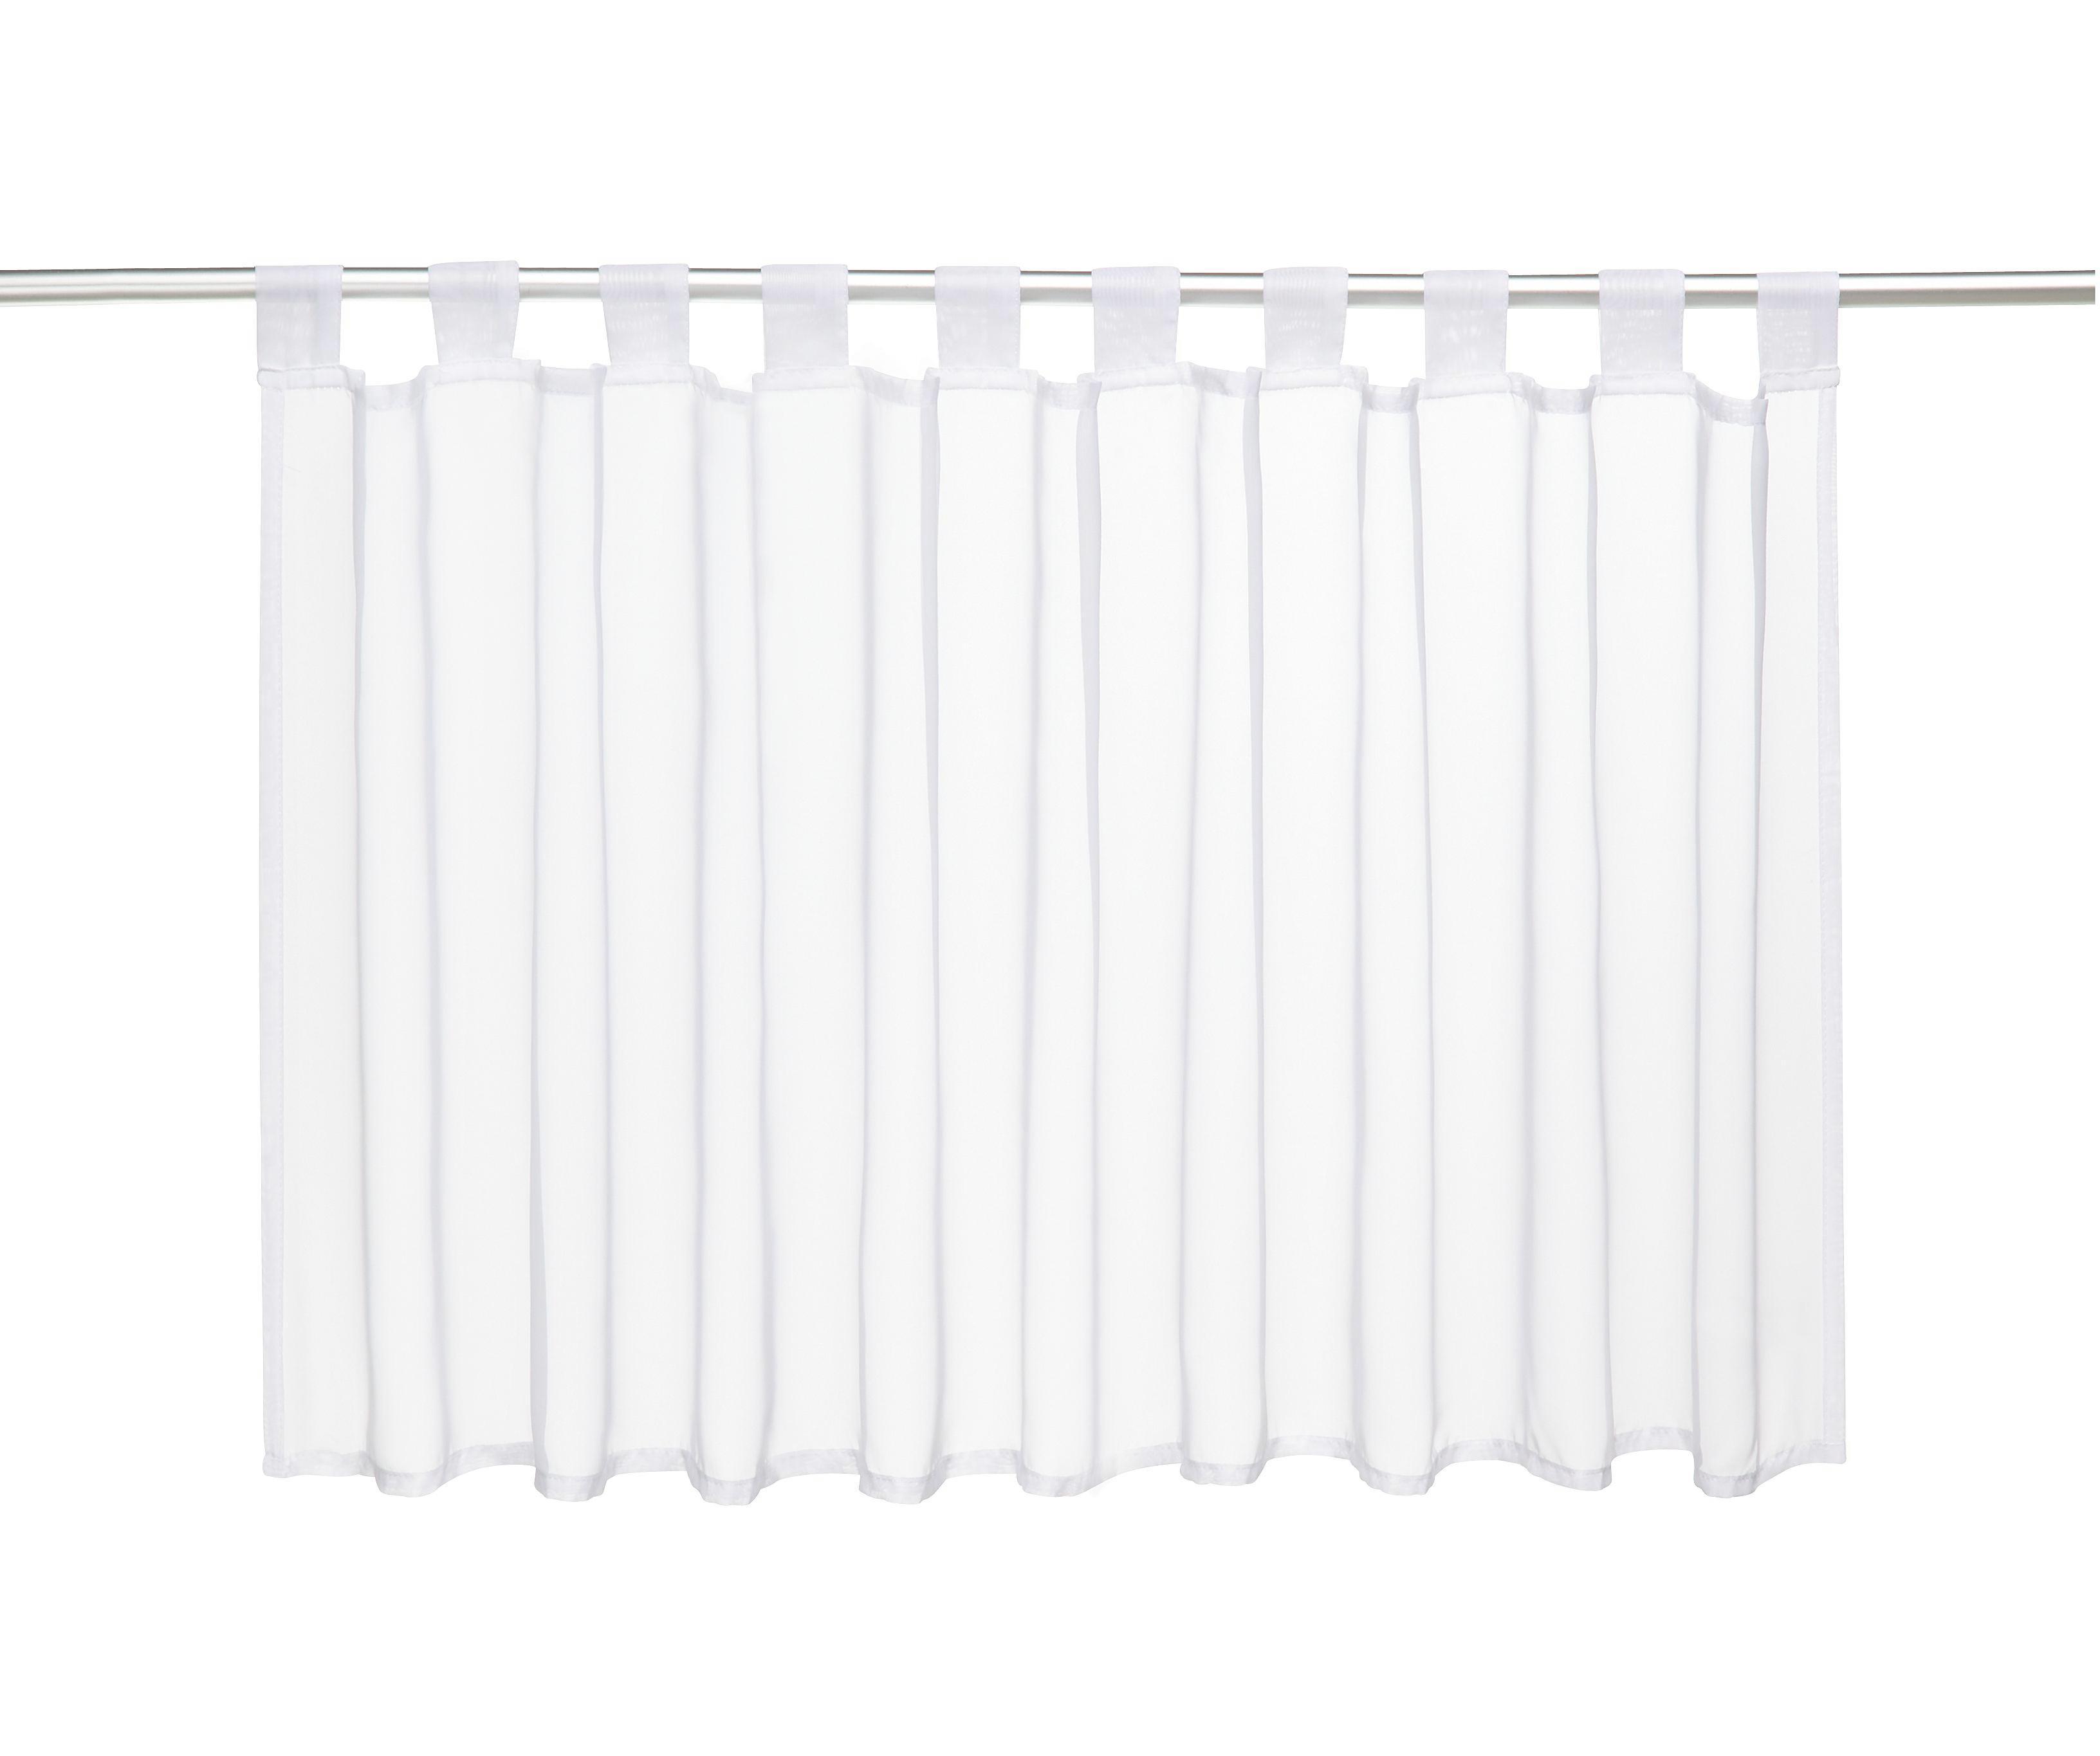 Vitrázsfüggöny Fehér - fehér, textil (145/50cm) - MÖMAX modern living